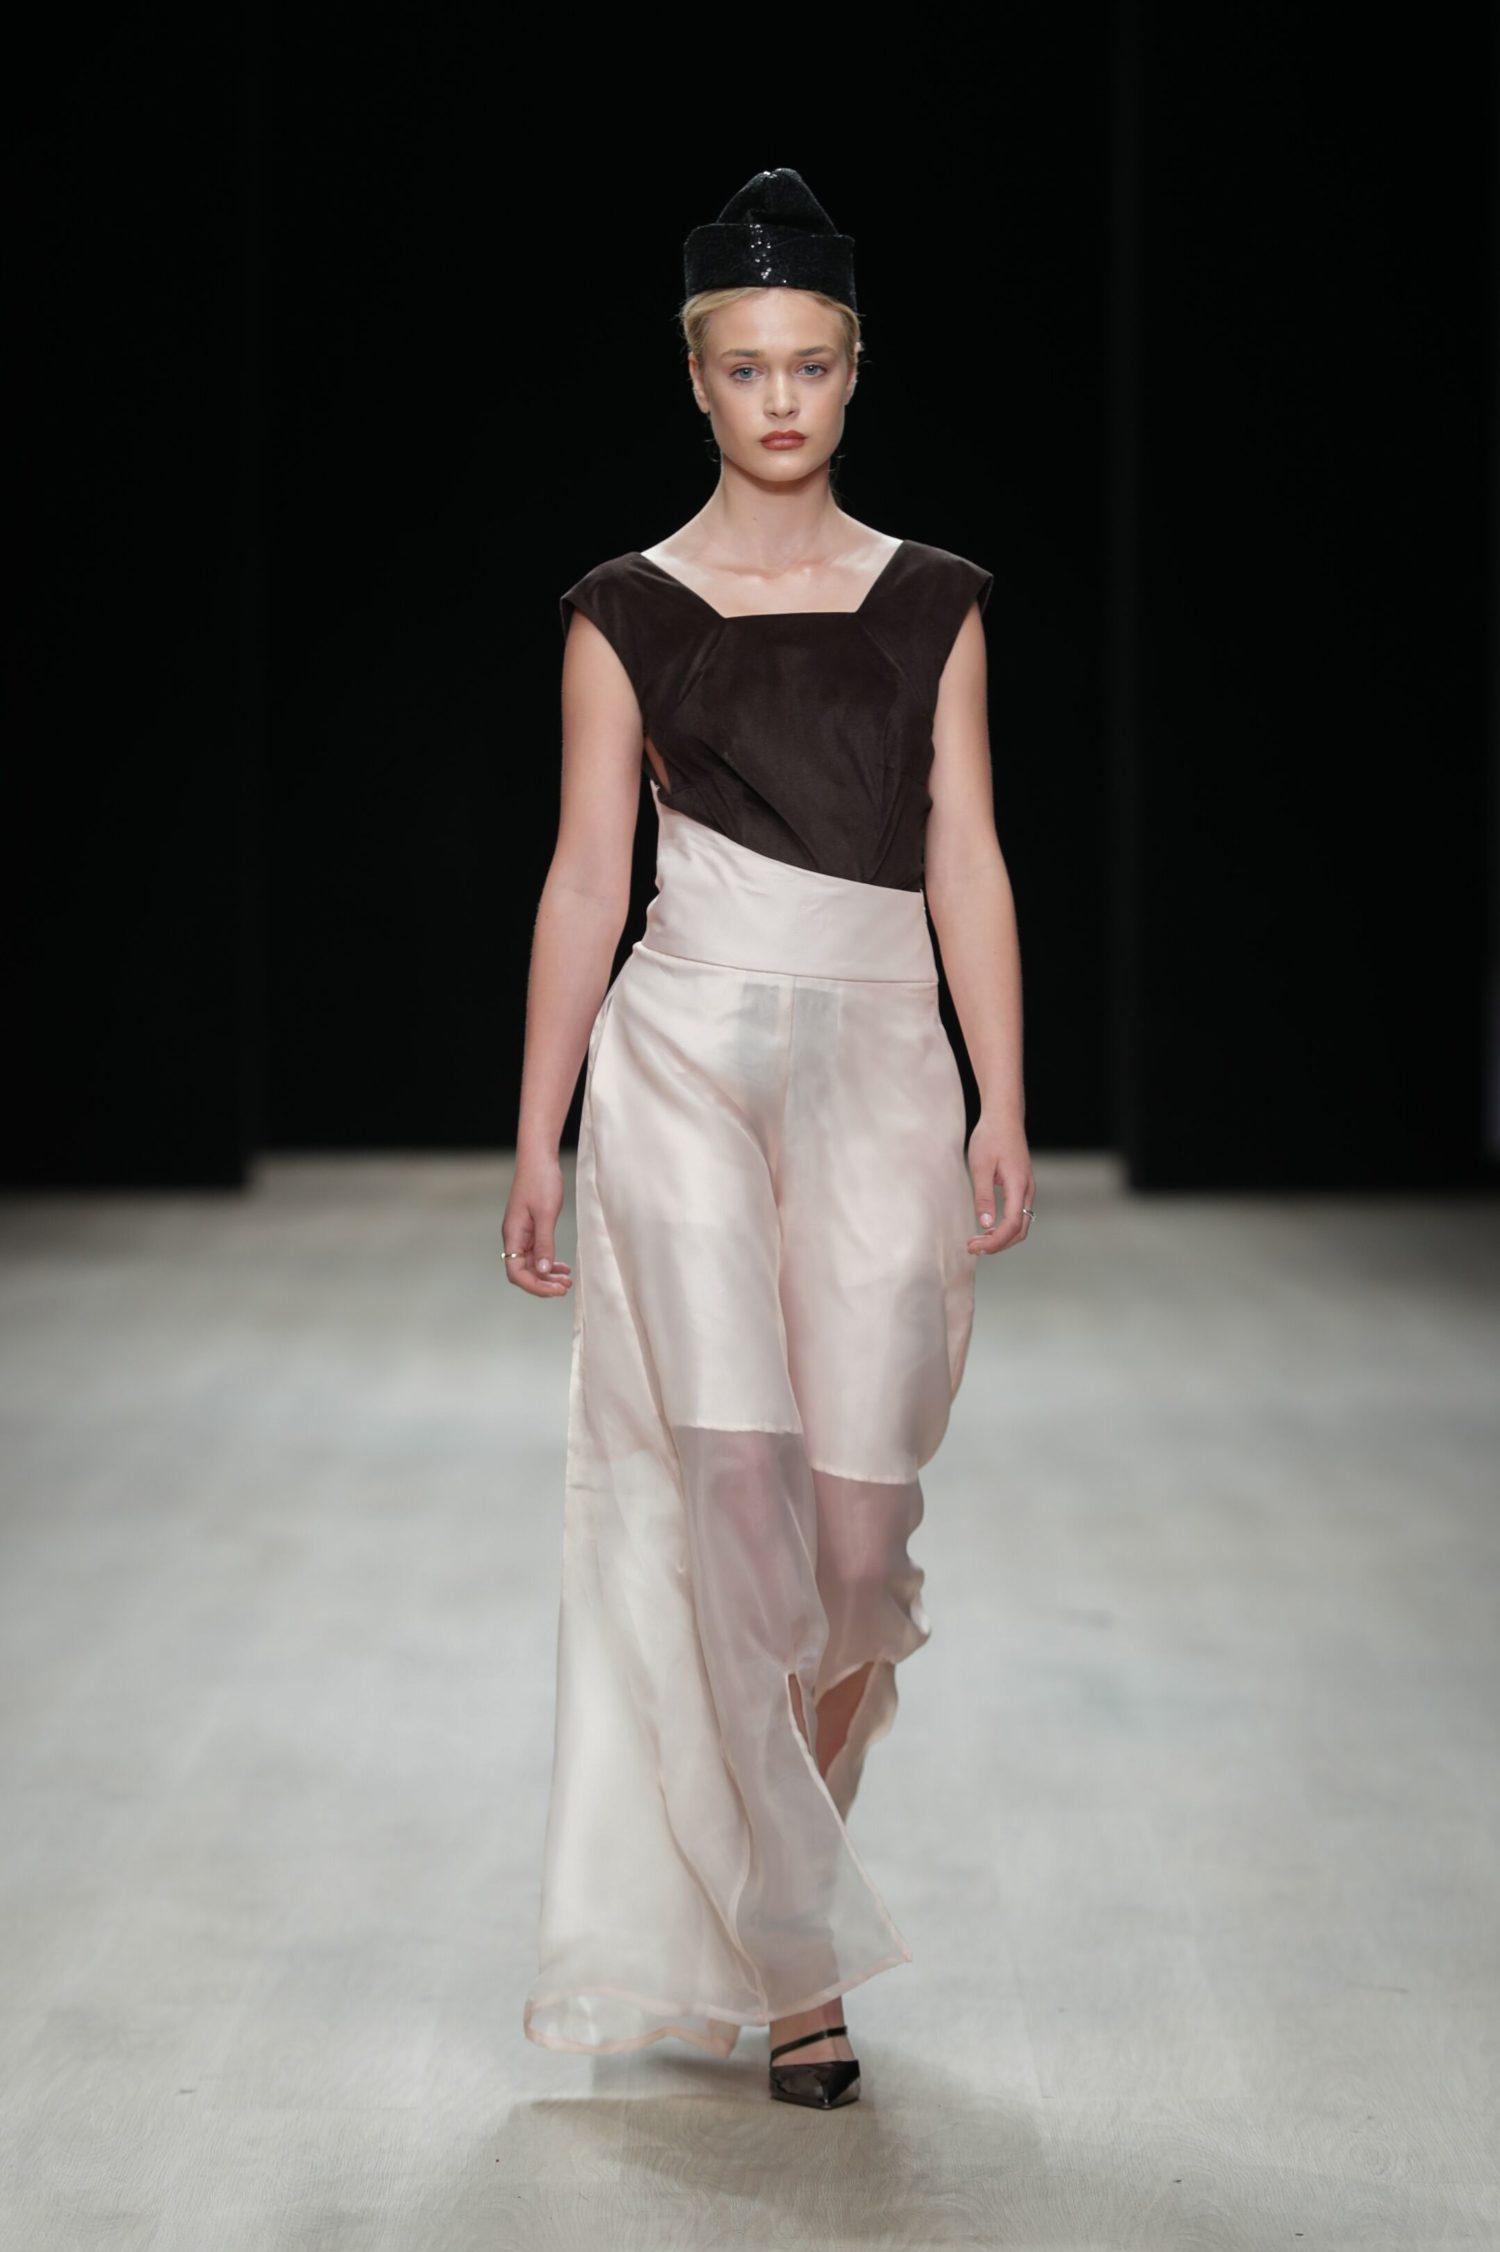 ARISE Fashion Week 2019 | Mwinda